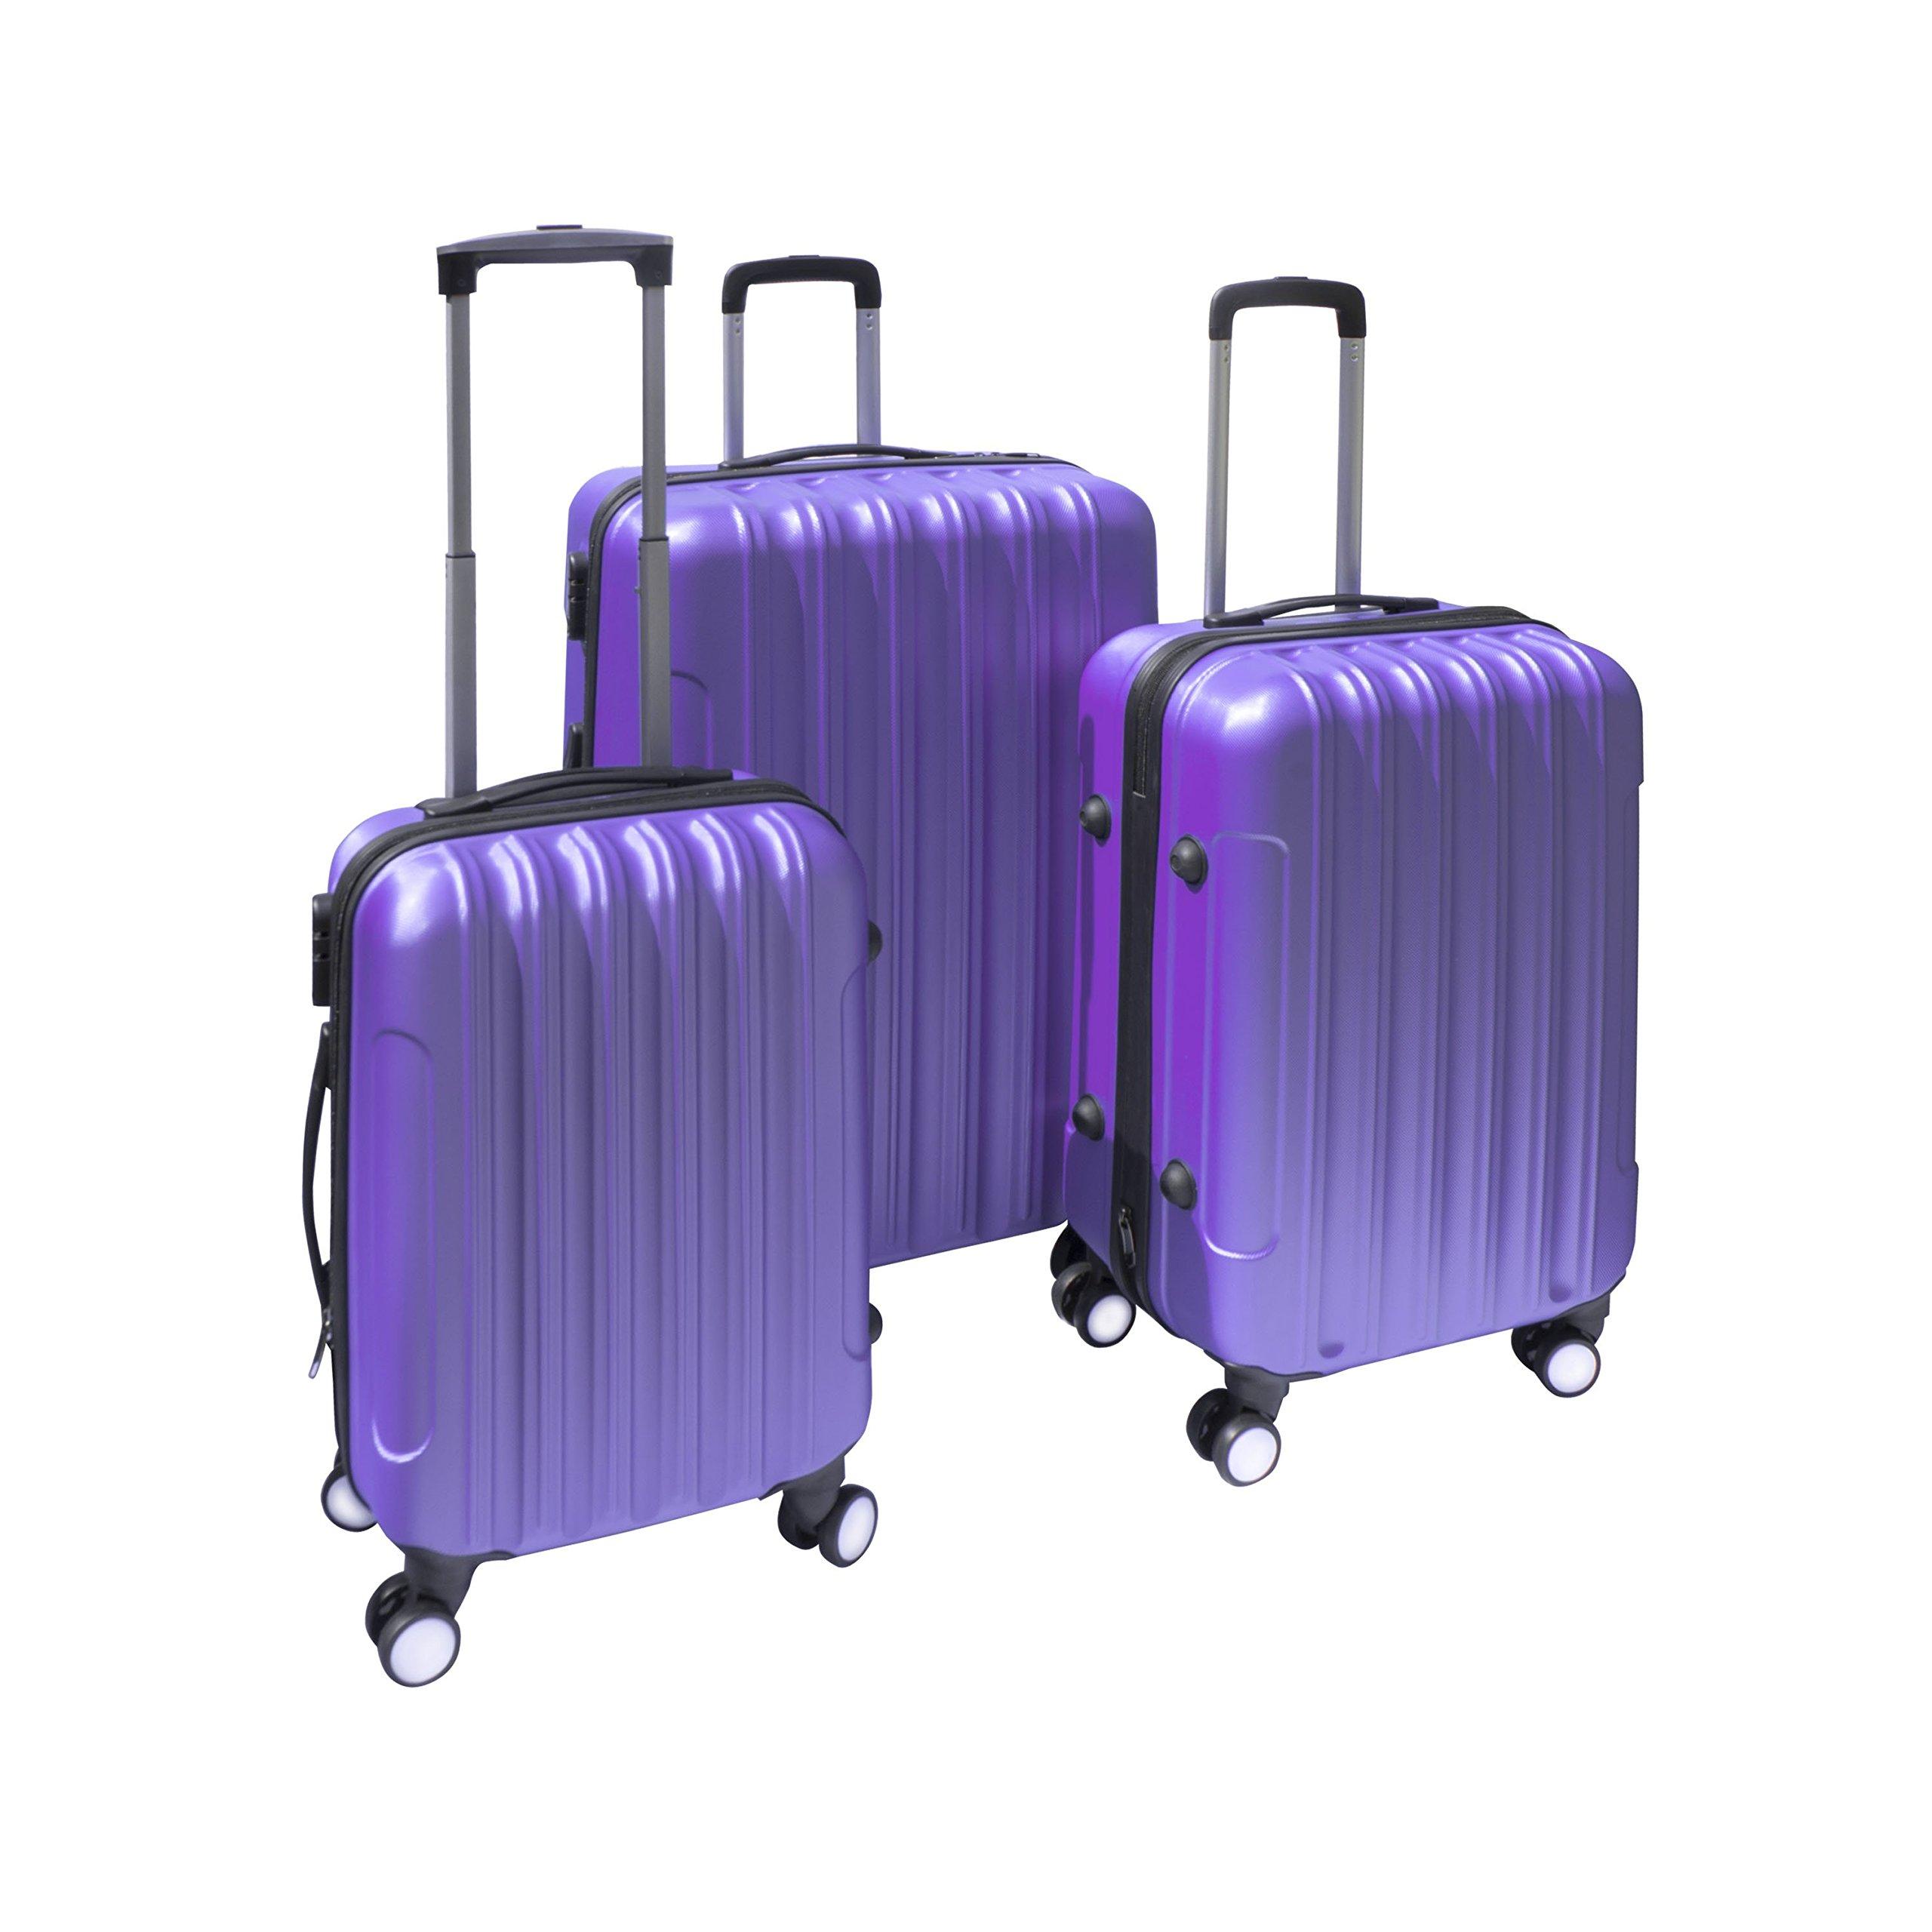 ALEKO 3 Piece Luggage Travel Bag Set ABS Suitcase With Lock, Purple Color